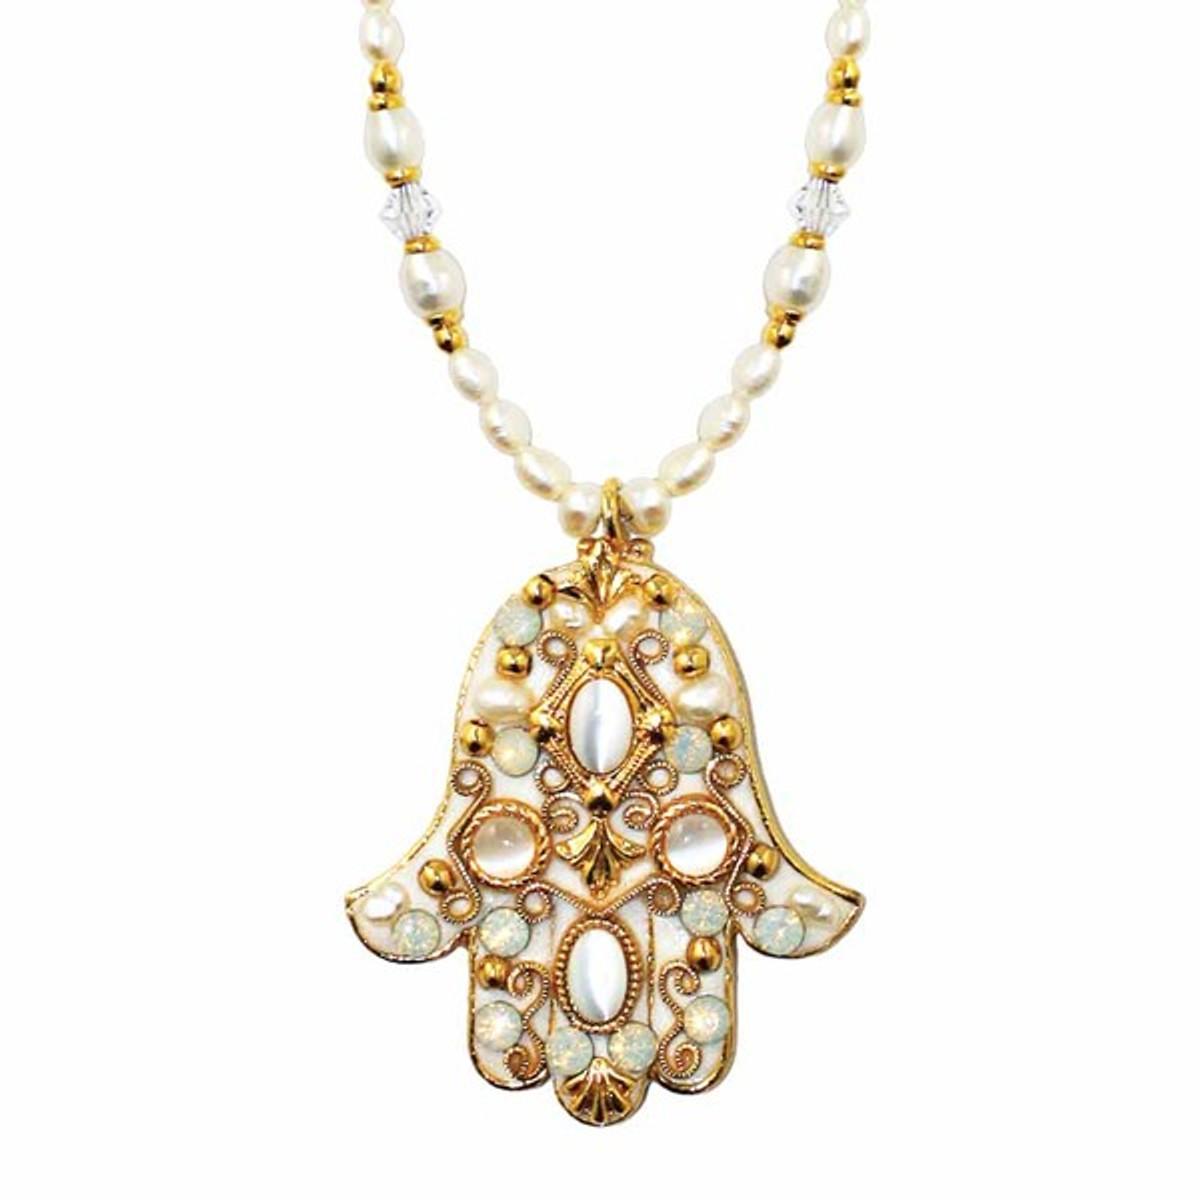 Michal Golan Jewelry Hamsa Necklace